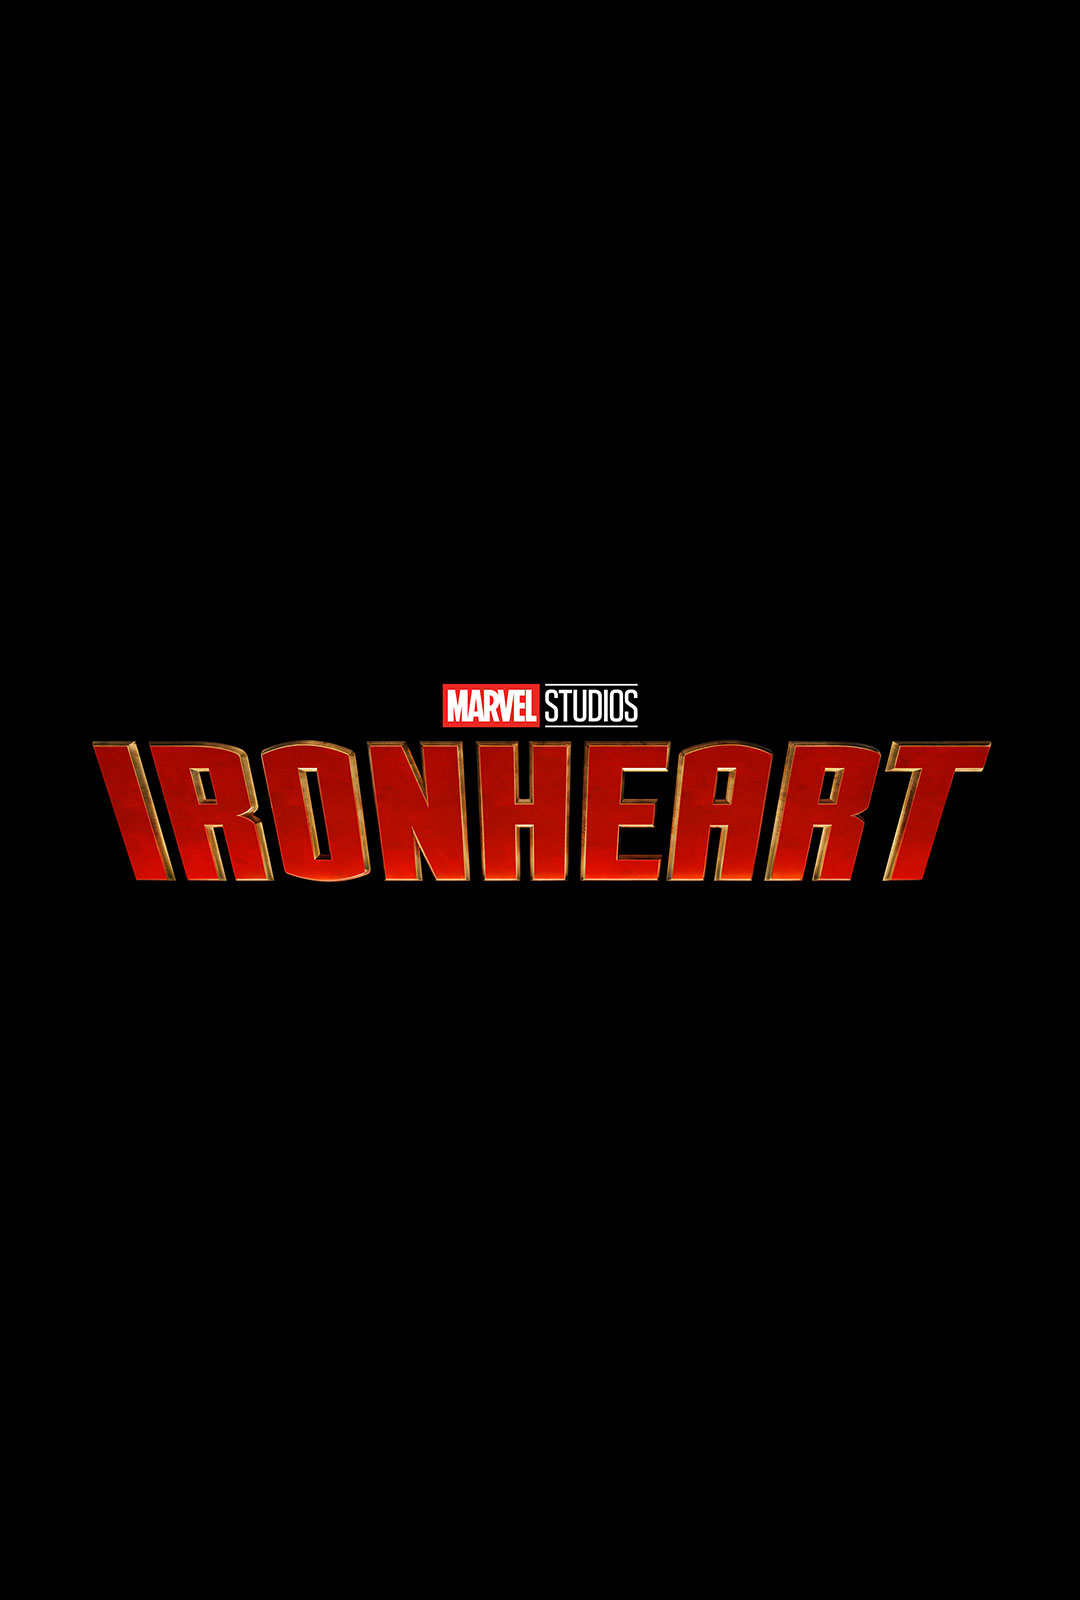 affiche poster ironheart disney marvel